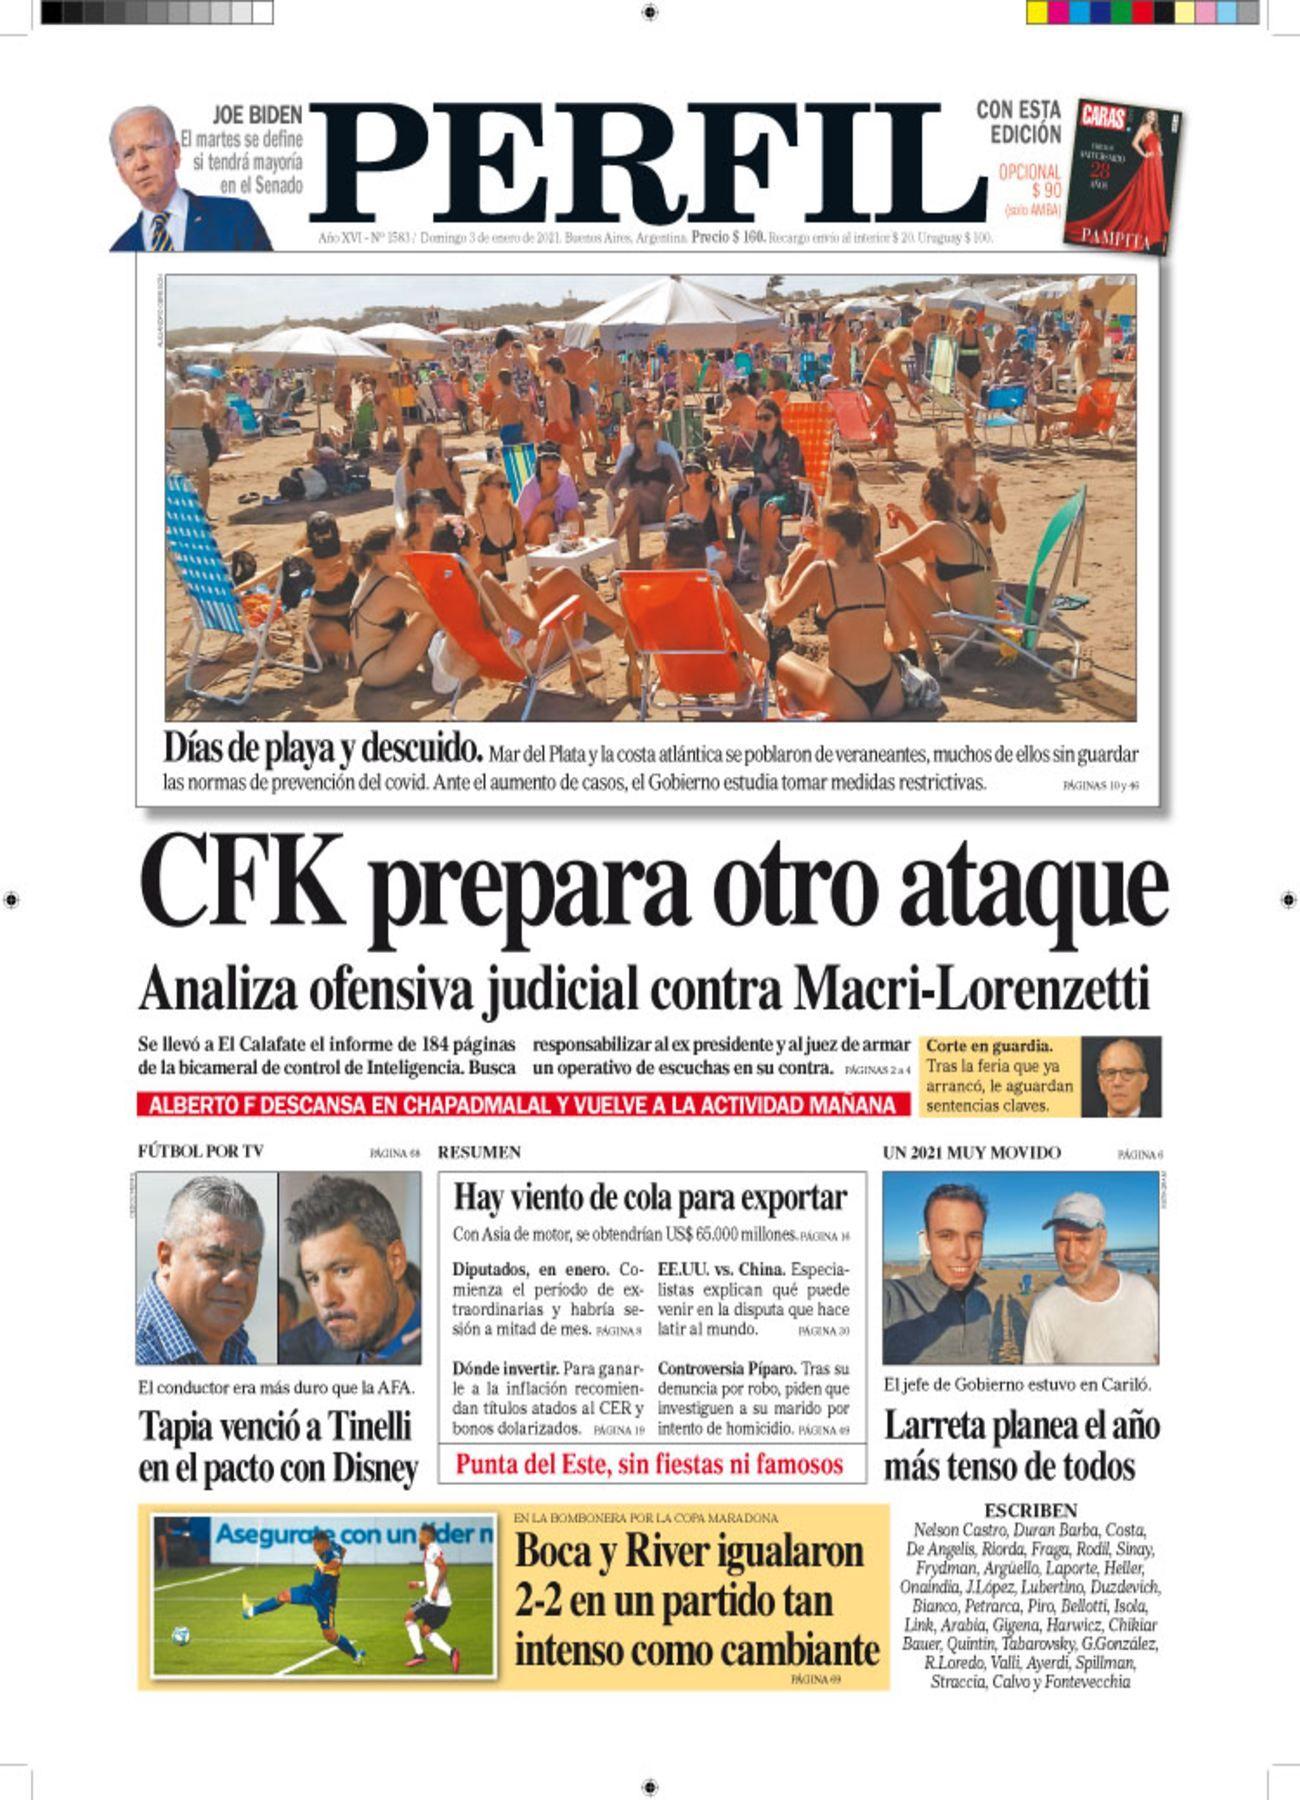 La tapa de Diario PERFIL de este domingo 3 de enero de 2021.